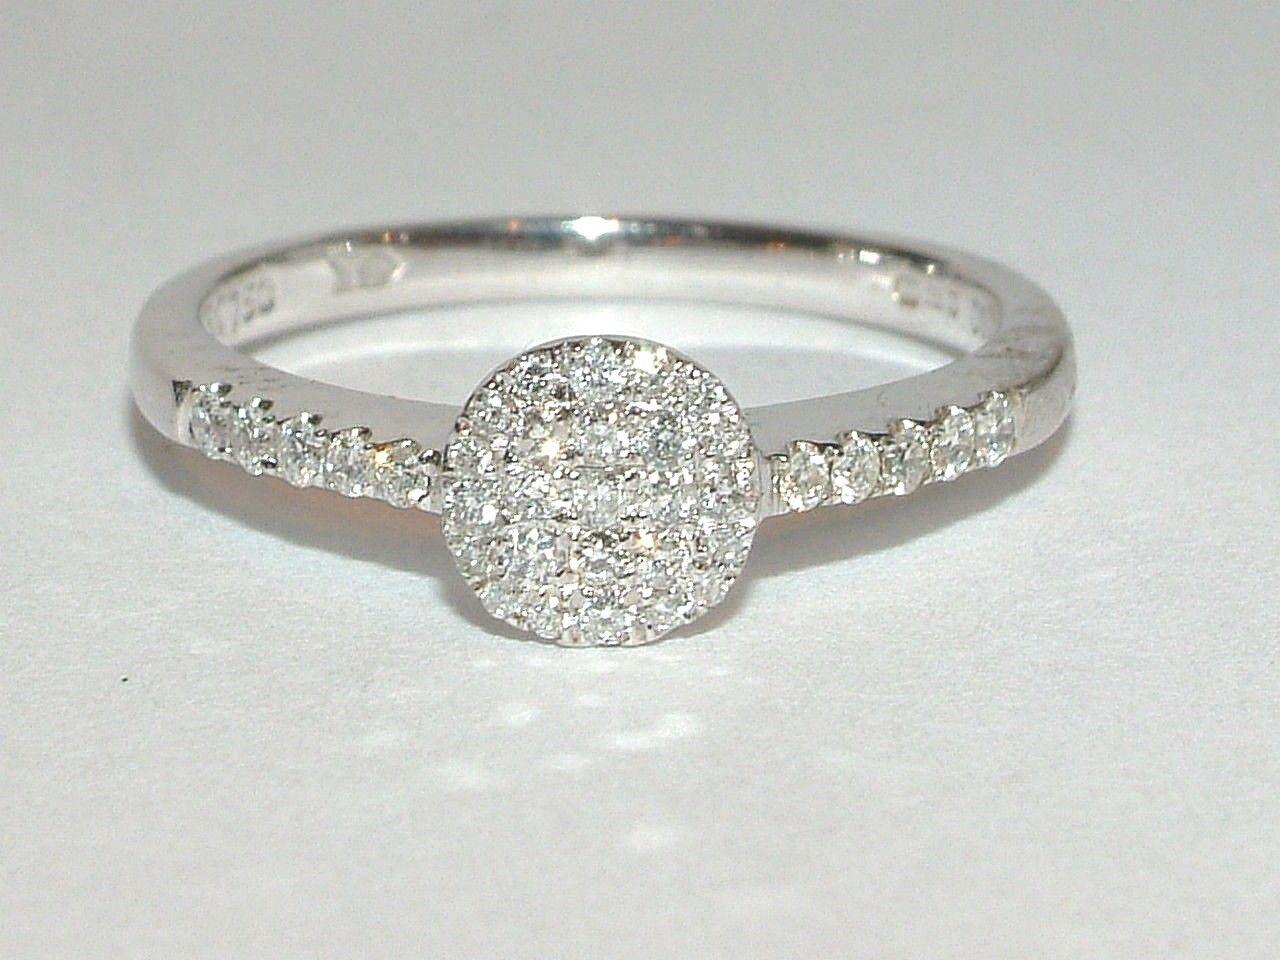 18 Carat w gold 0.33 carat diamond cluster ring with side diamonds